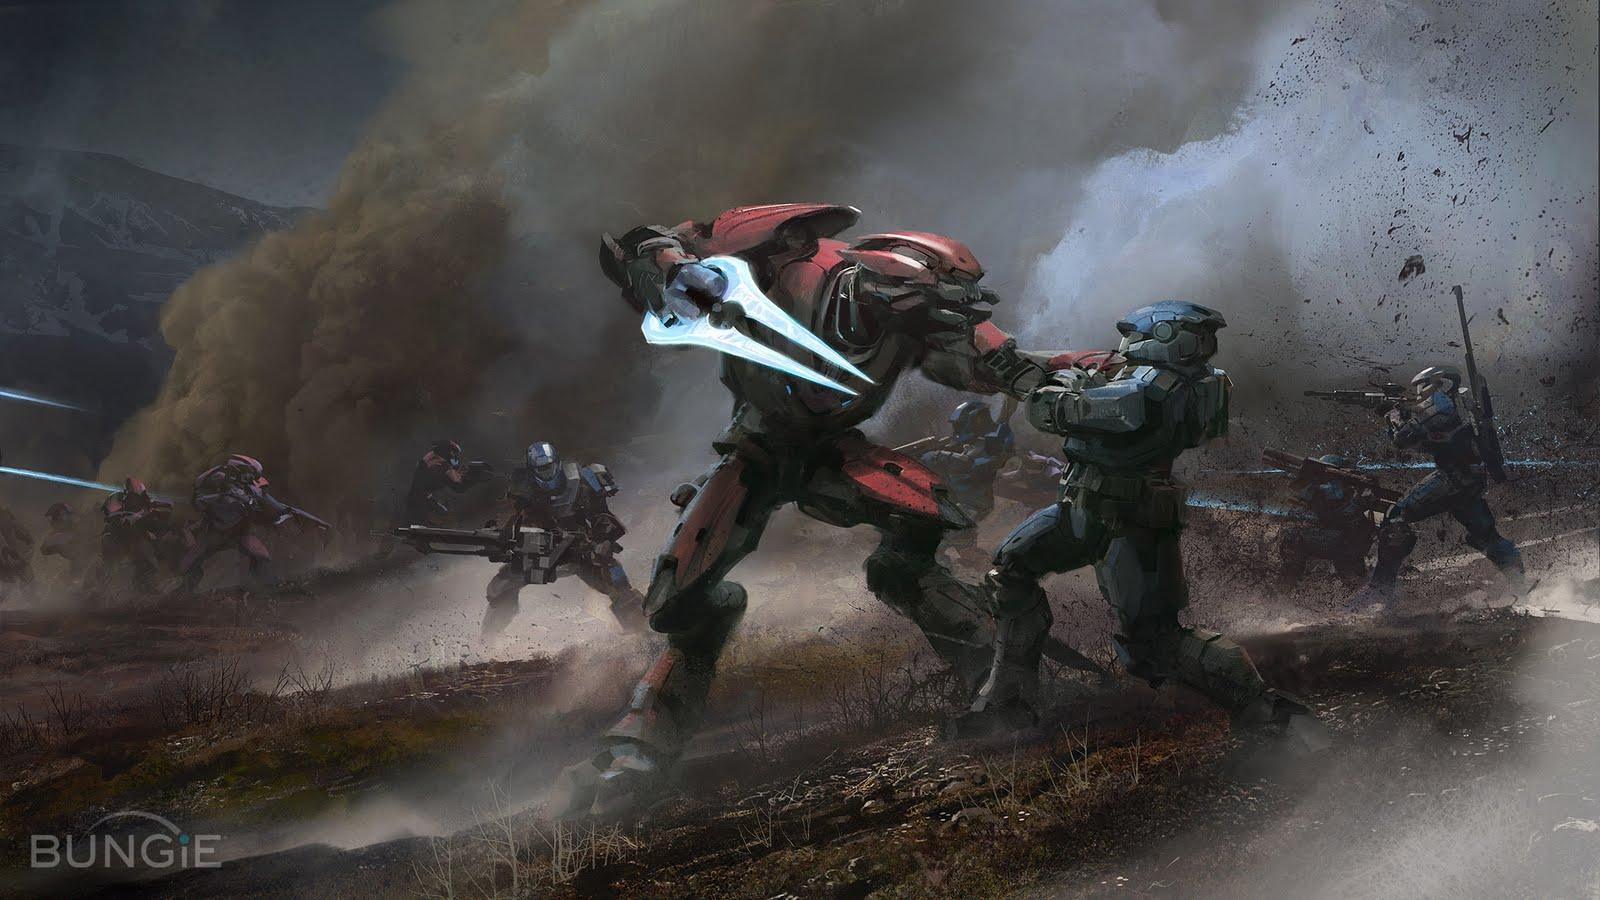 Halo Wars Spartan Wallpaper 4509 Hd Wallpapers in Games   Imagescicom 1600x900